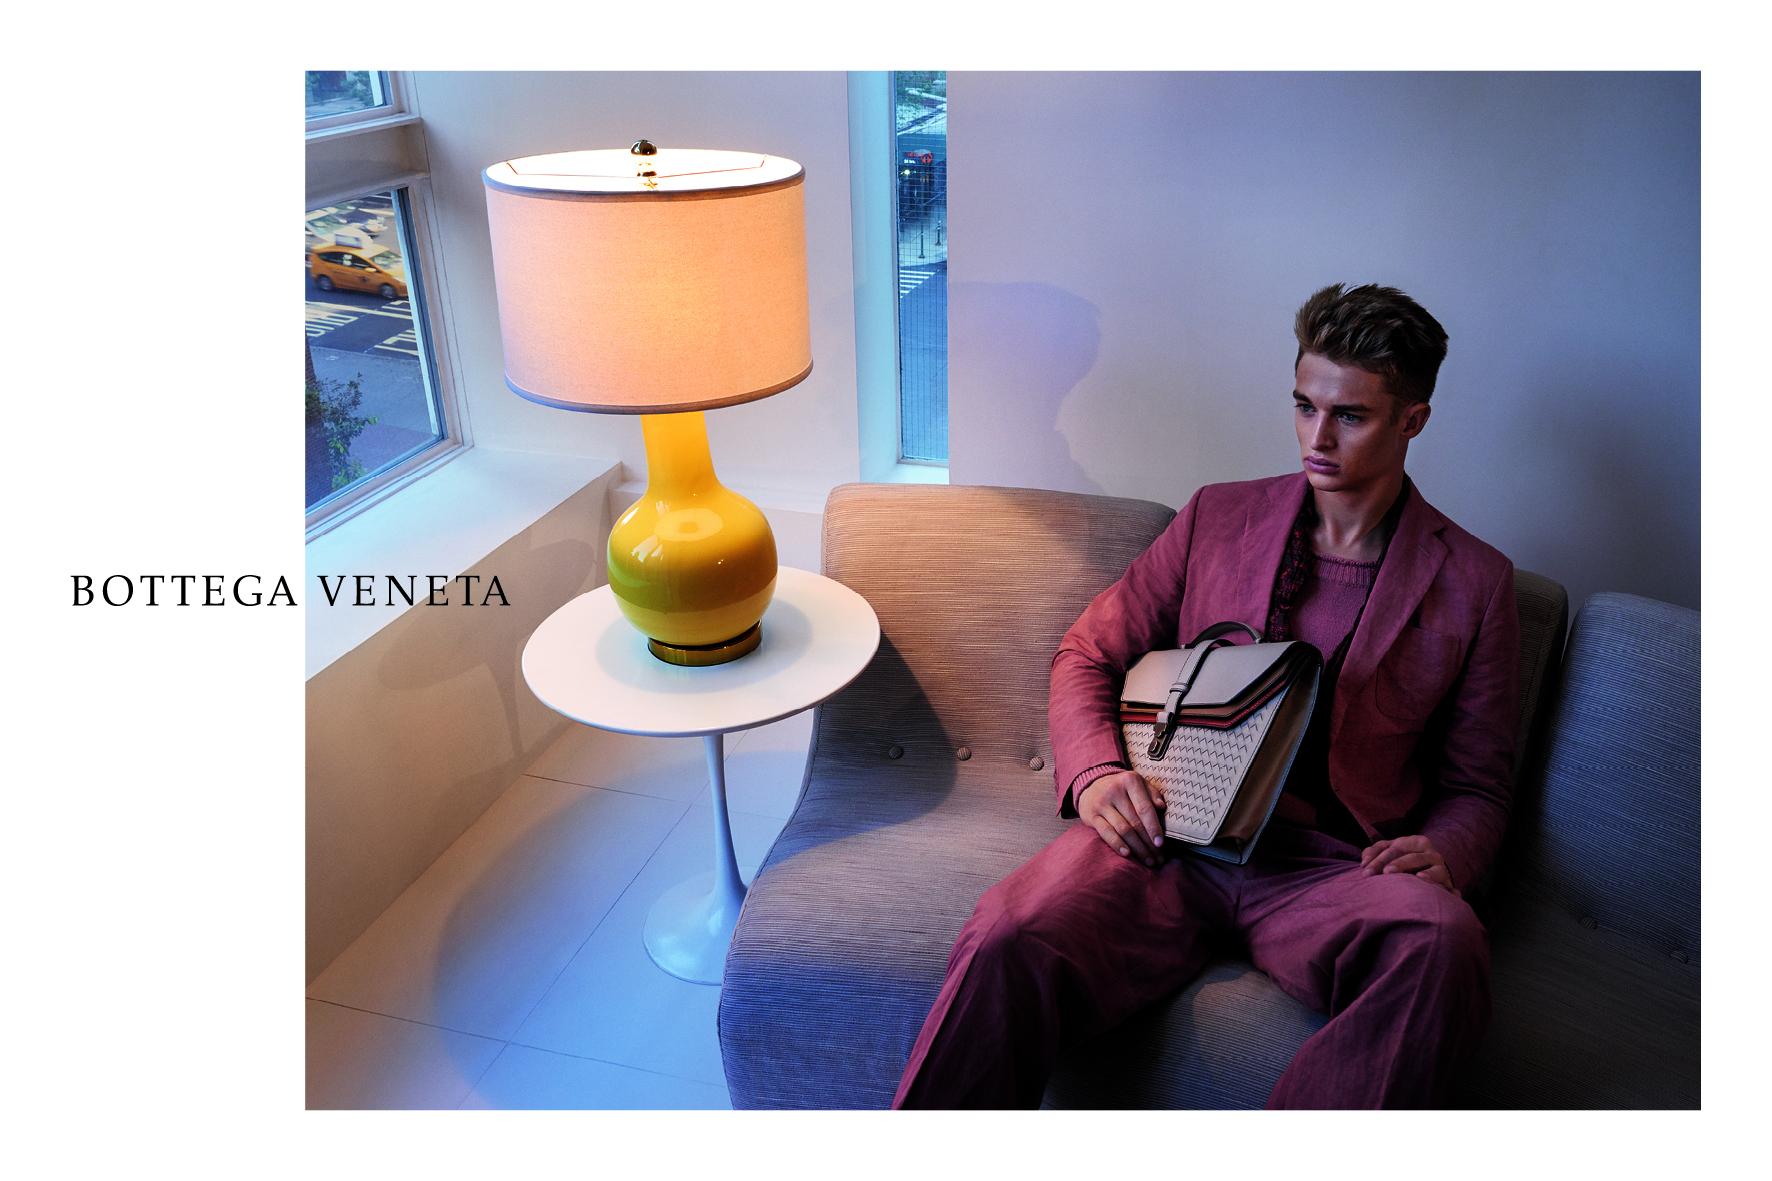 Bottega-Veneta-spring-2017-ad-campaign-the-impression-04[1]